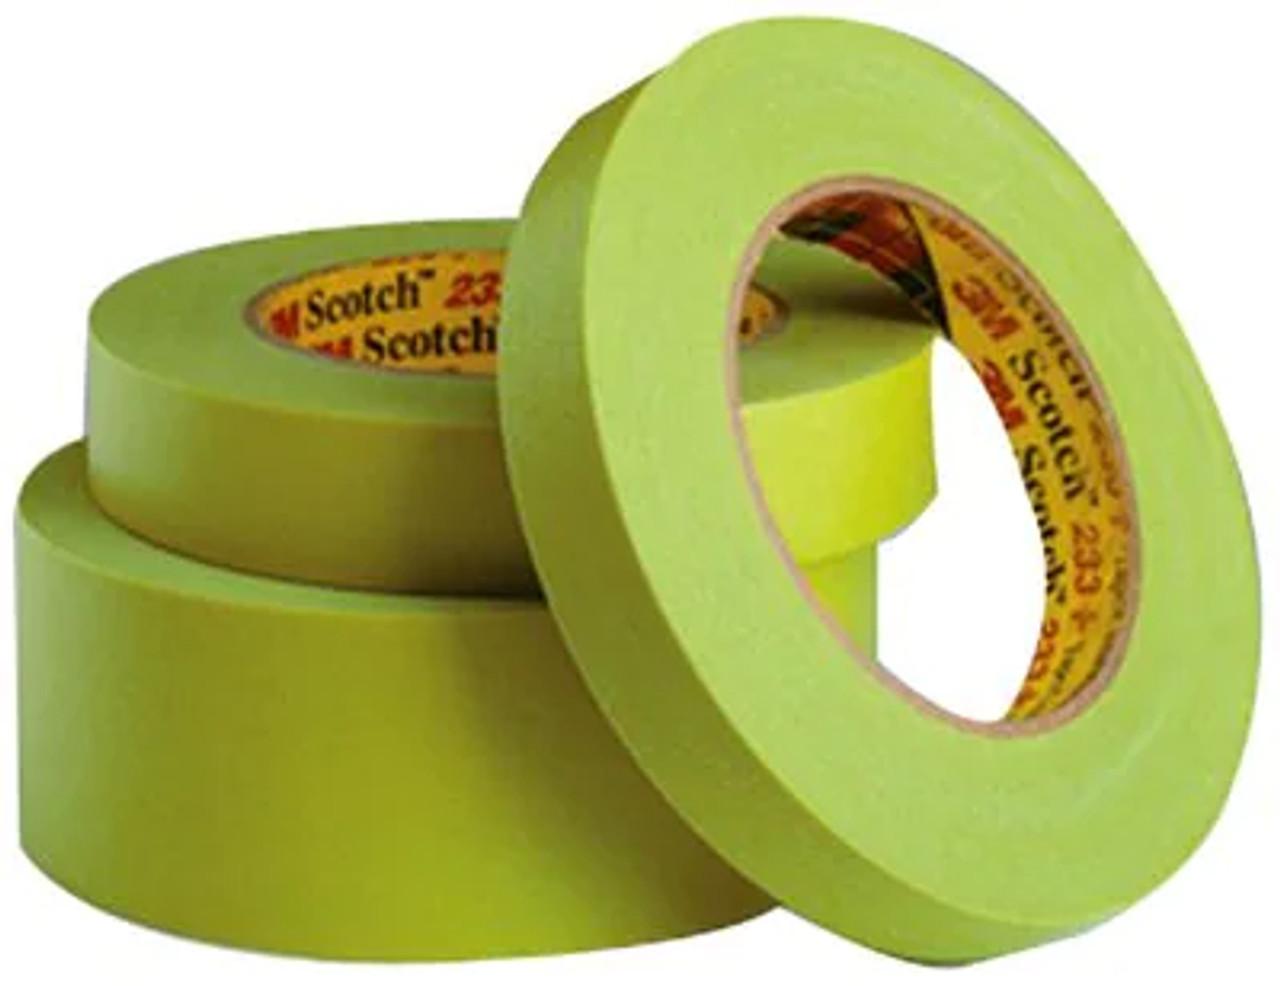 Scotch® Performance Masking Tape 233+ 26344, Green, 6 mm x 55 m